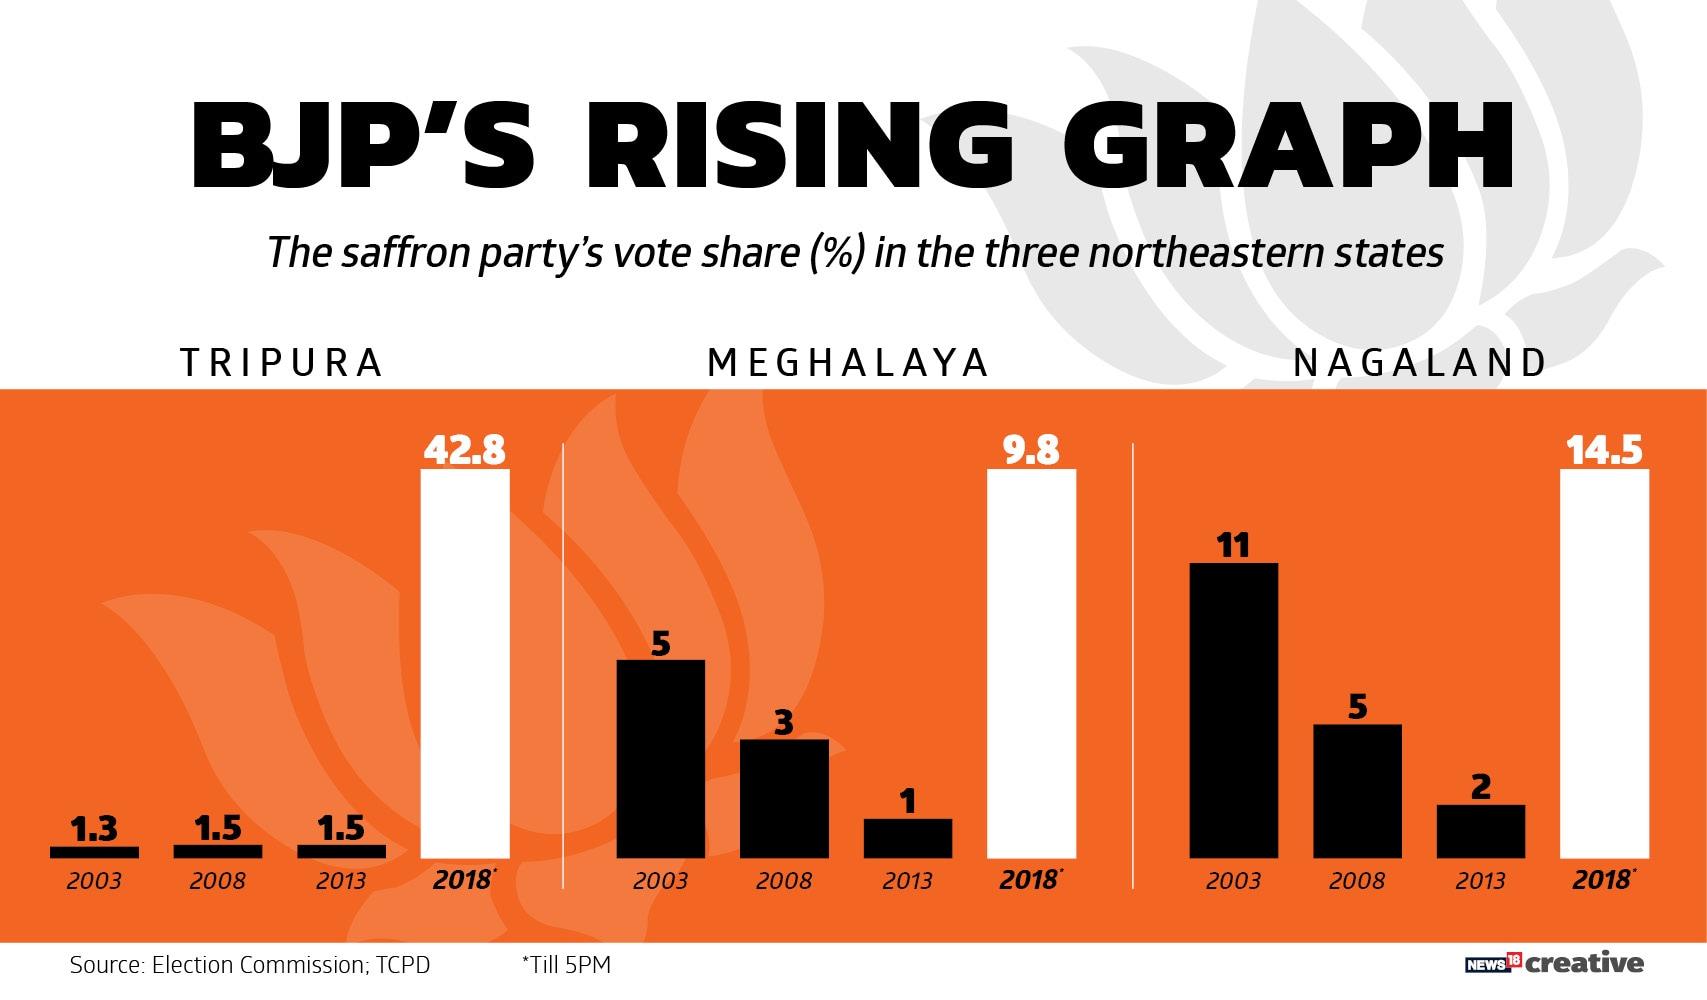 BJPs Rising Graph